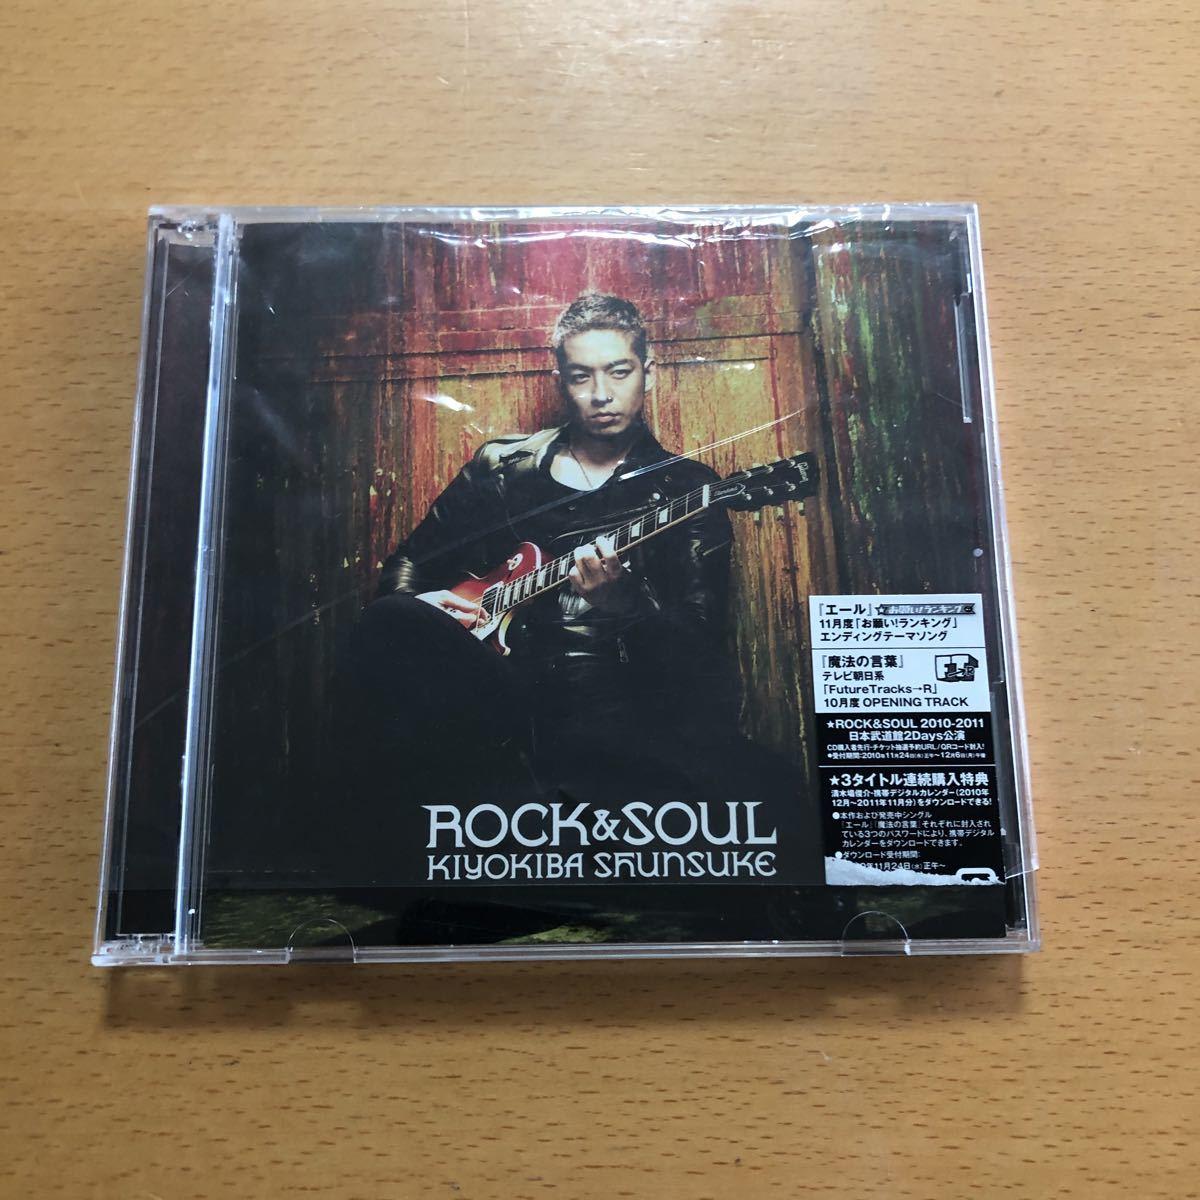 清木場俊介『ROCK&SOUL』初回限定盤CD+DVD☆帯付☆美品☆アルバム☆71_画像1